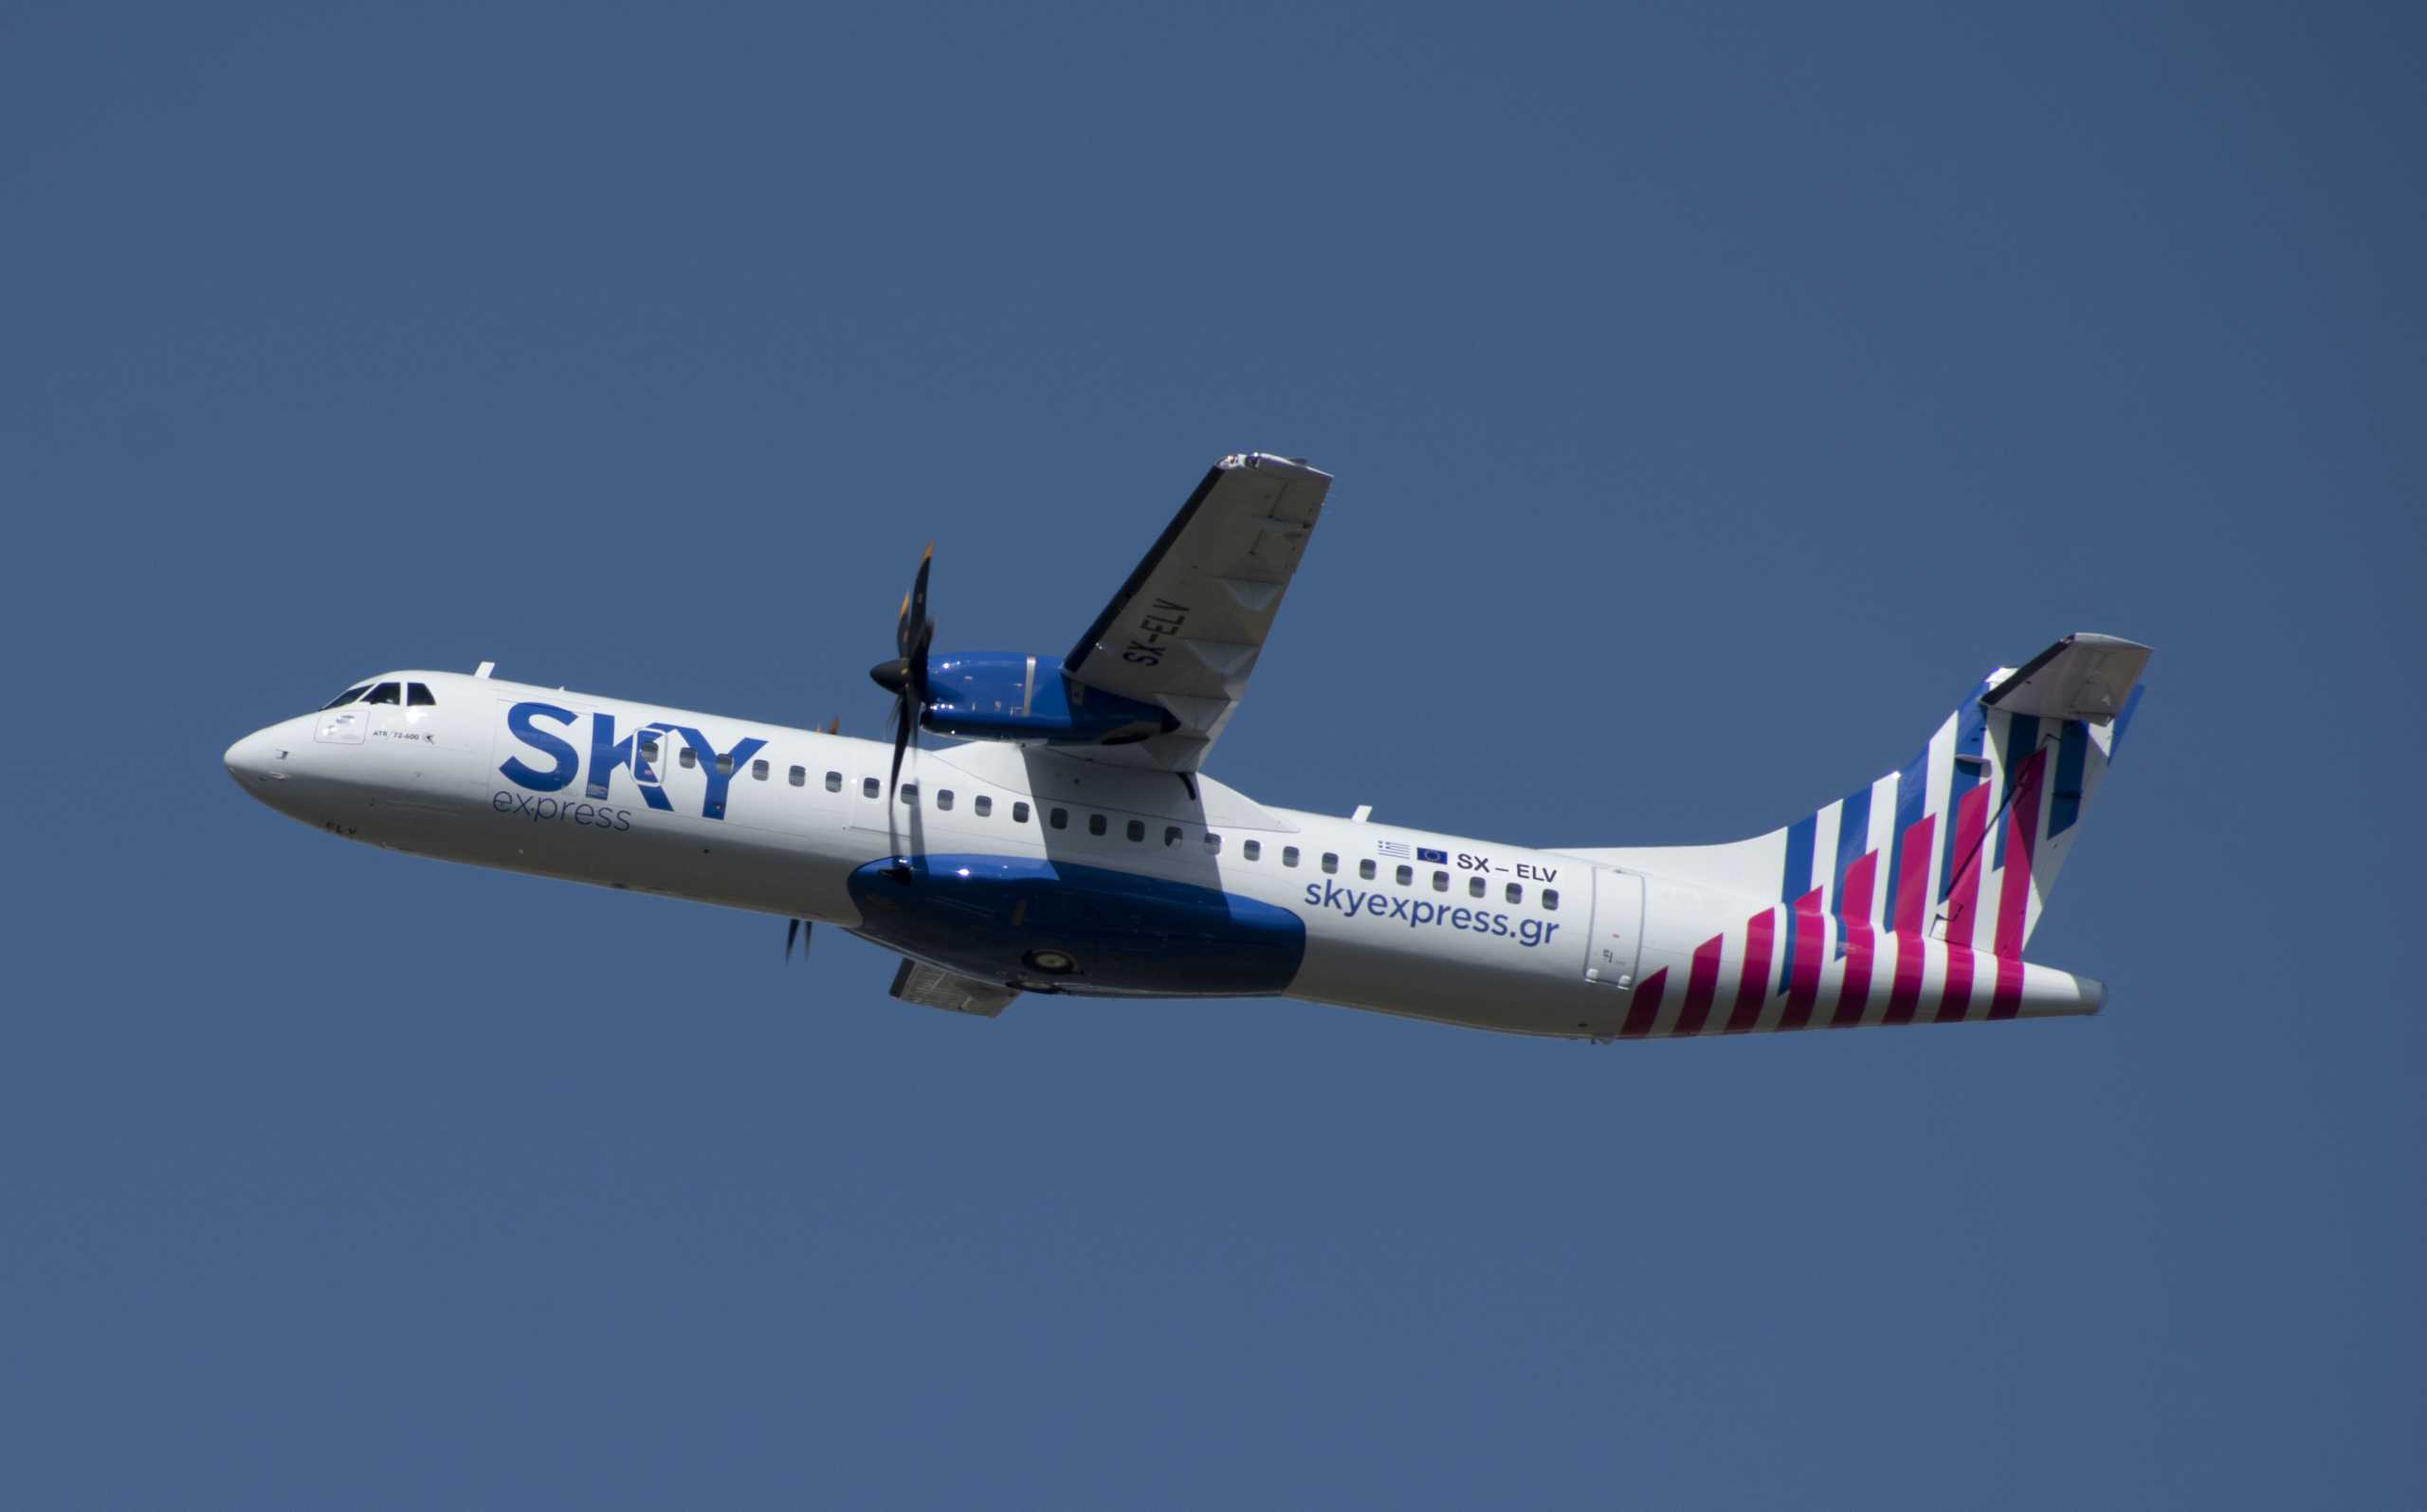 SKY express: Ξεκίνησαν οι απευθείας πτήσεις για Λονδίνο